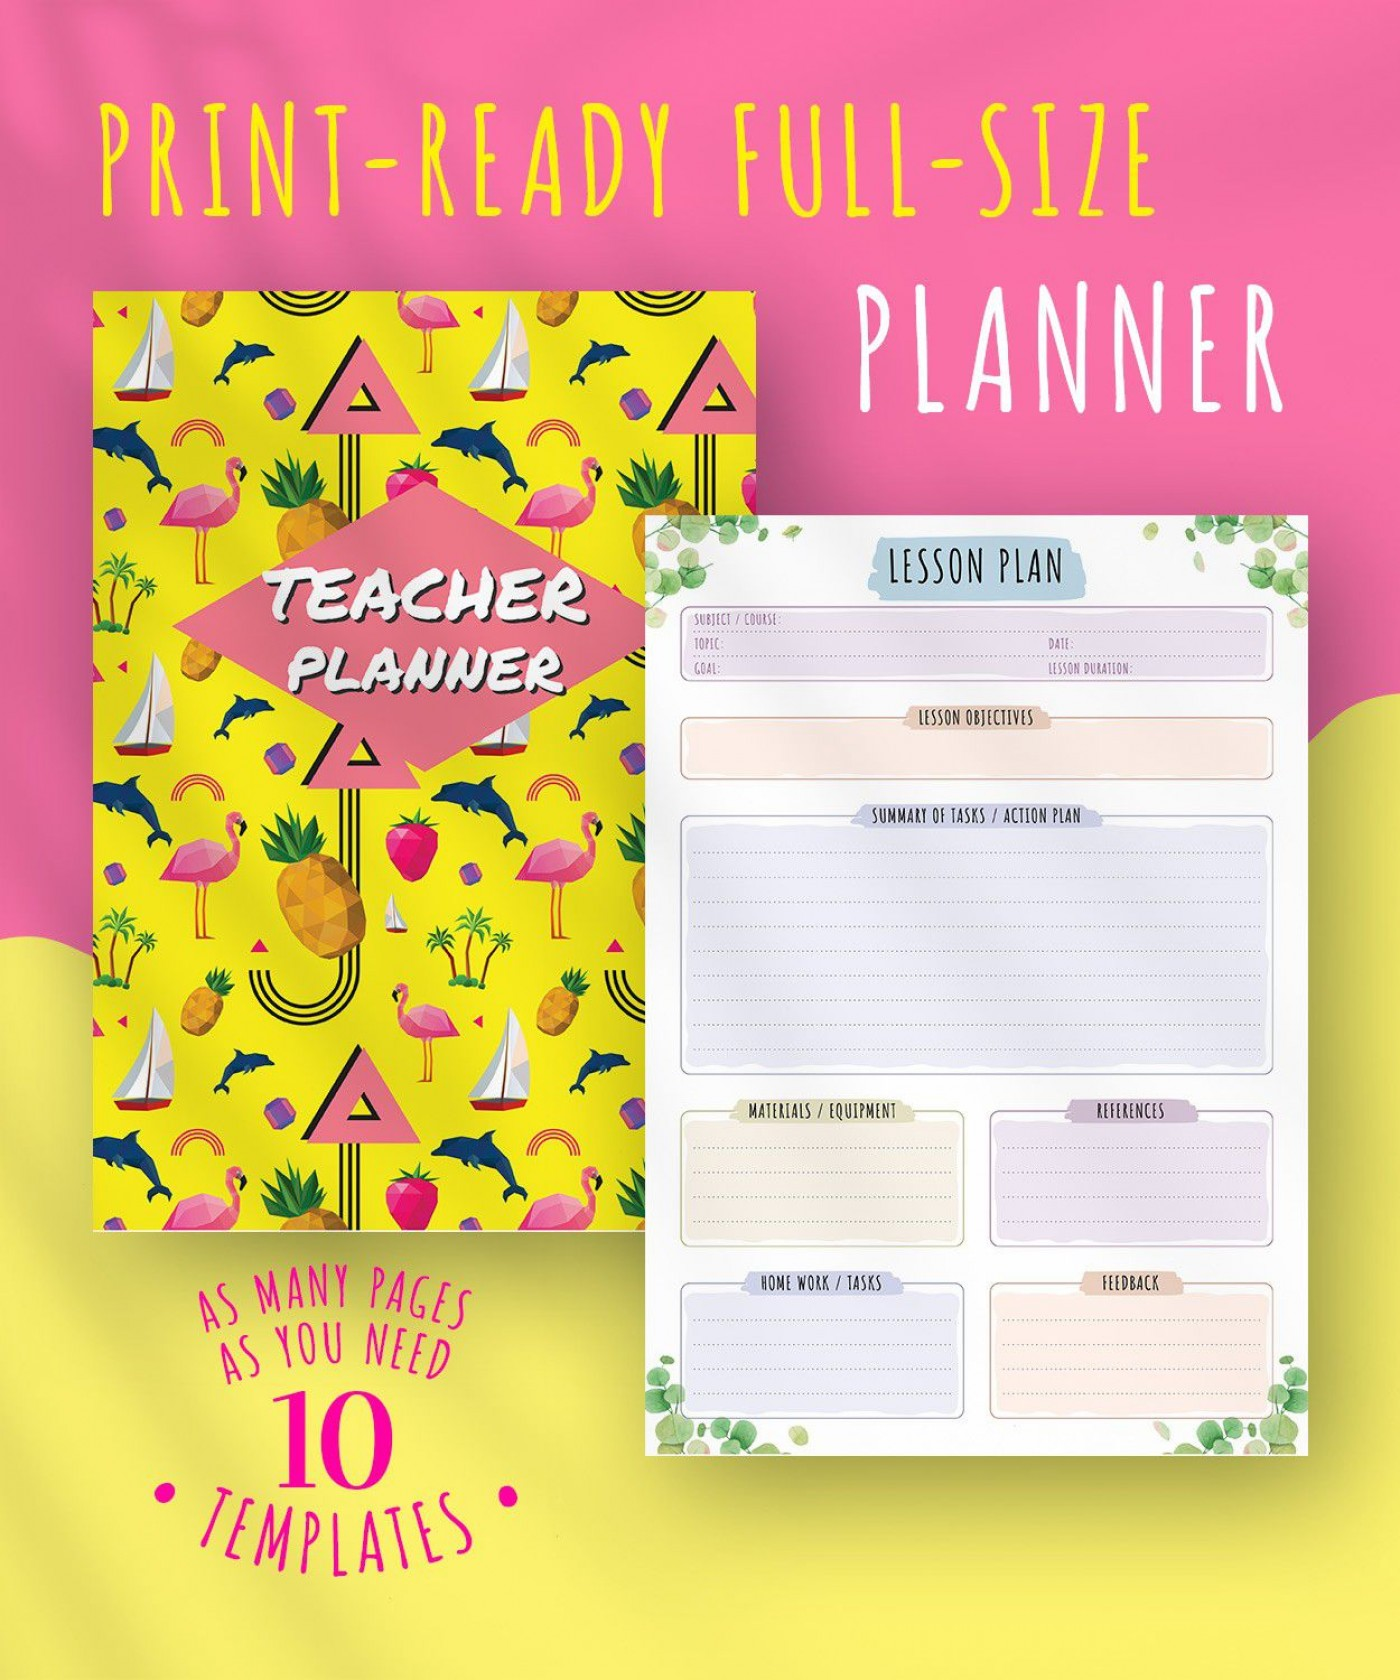 008 Magnificent Free Printable Teacher Binder Template Photo 1400